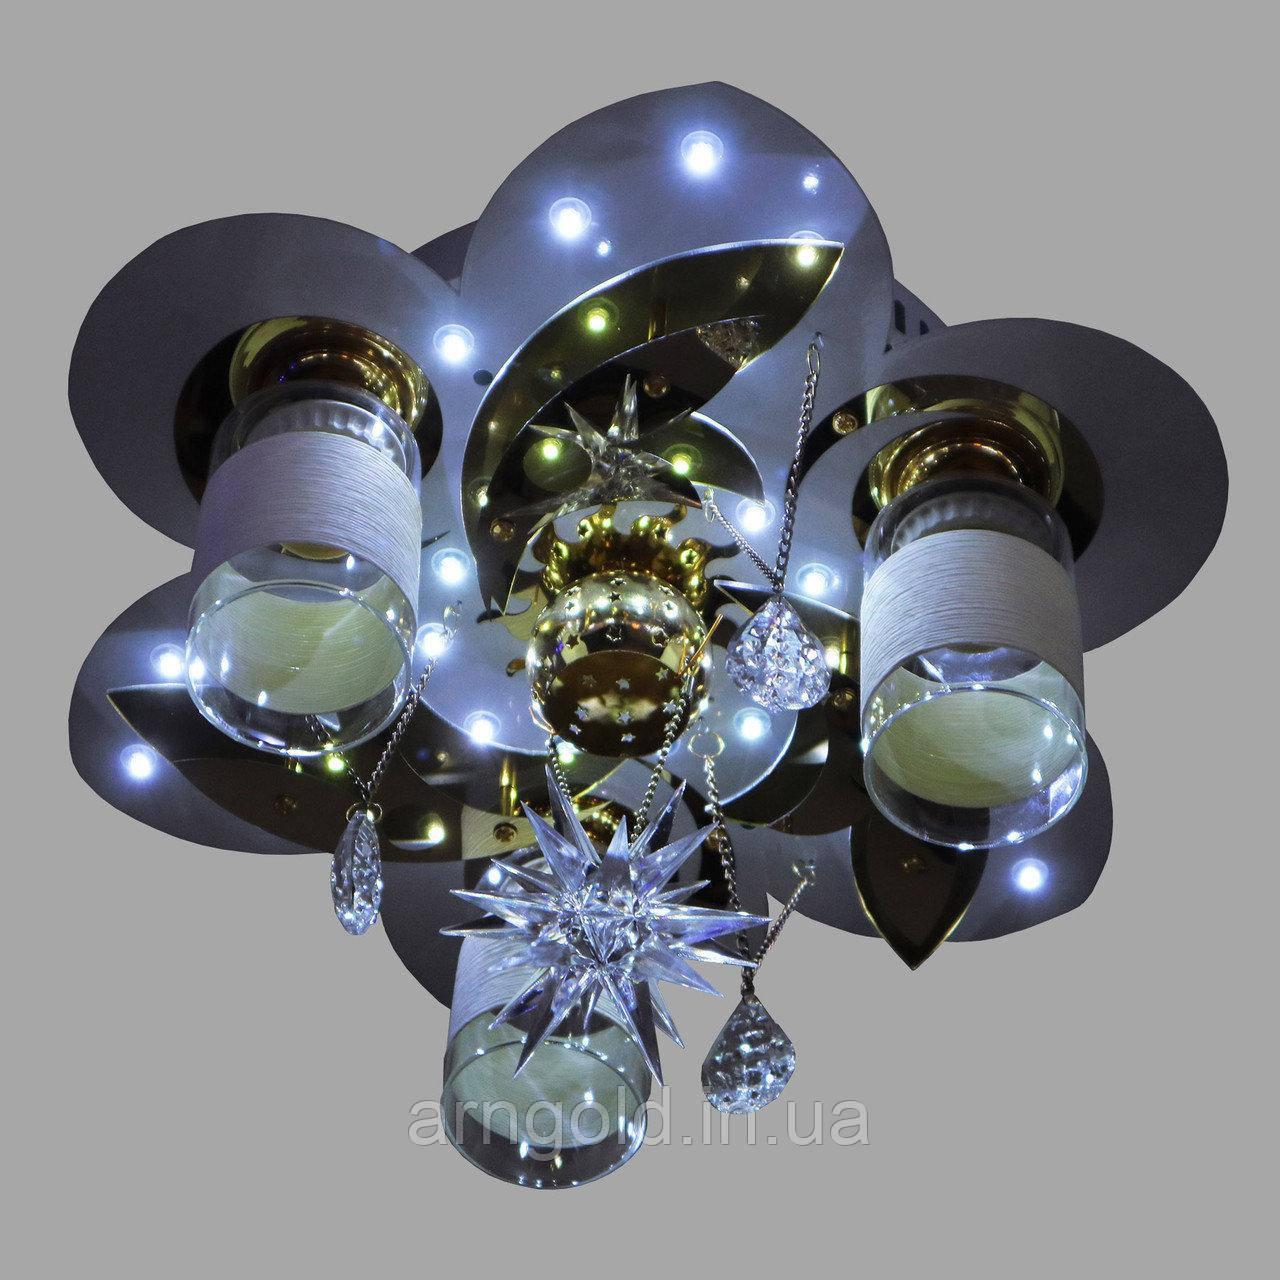 Люстра RGB LED  Космос 5-70119/3+1 D400